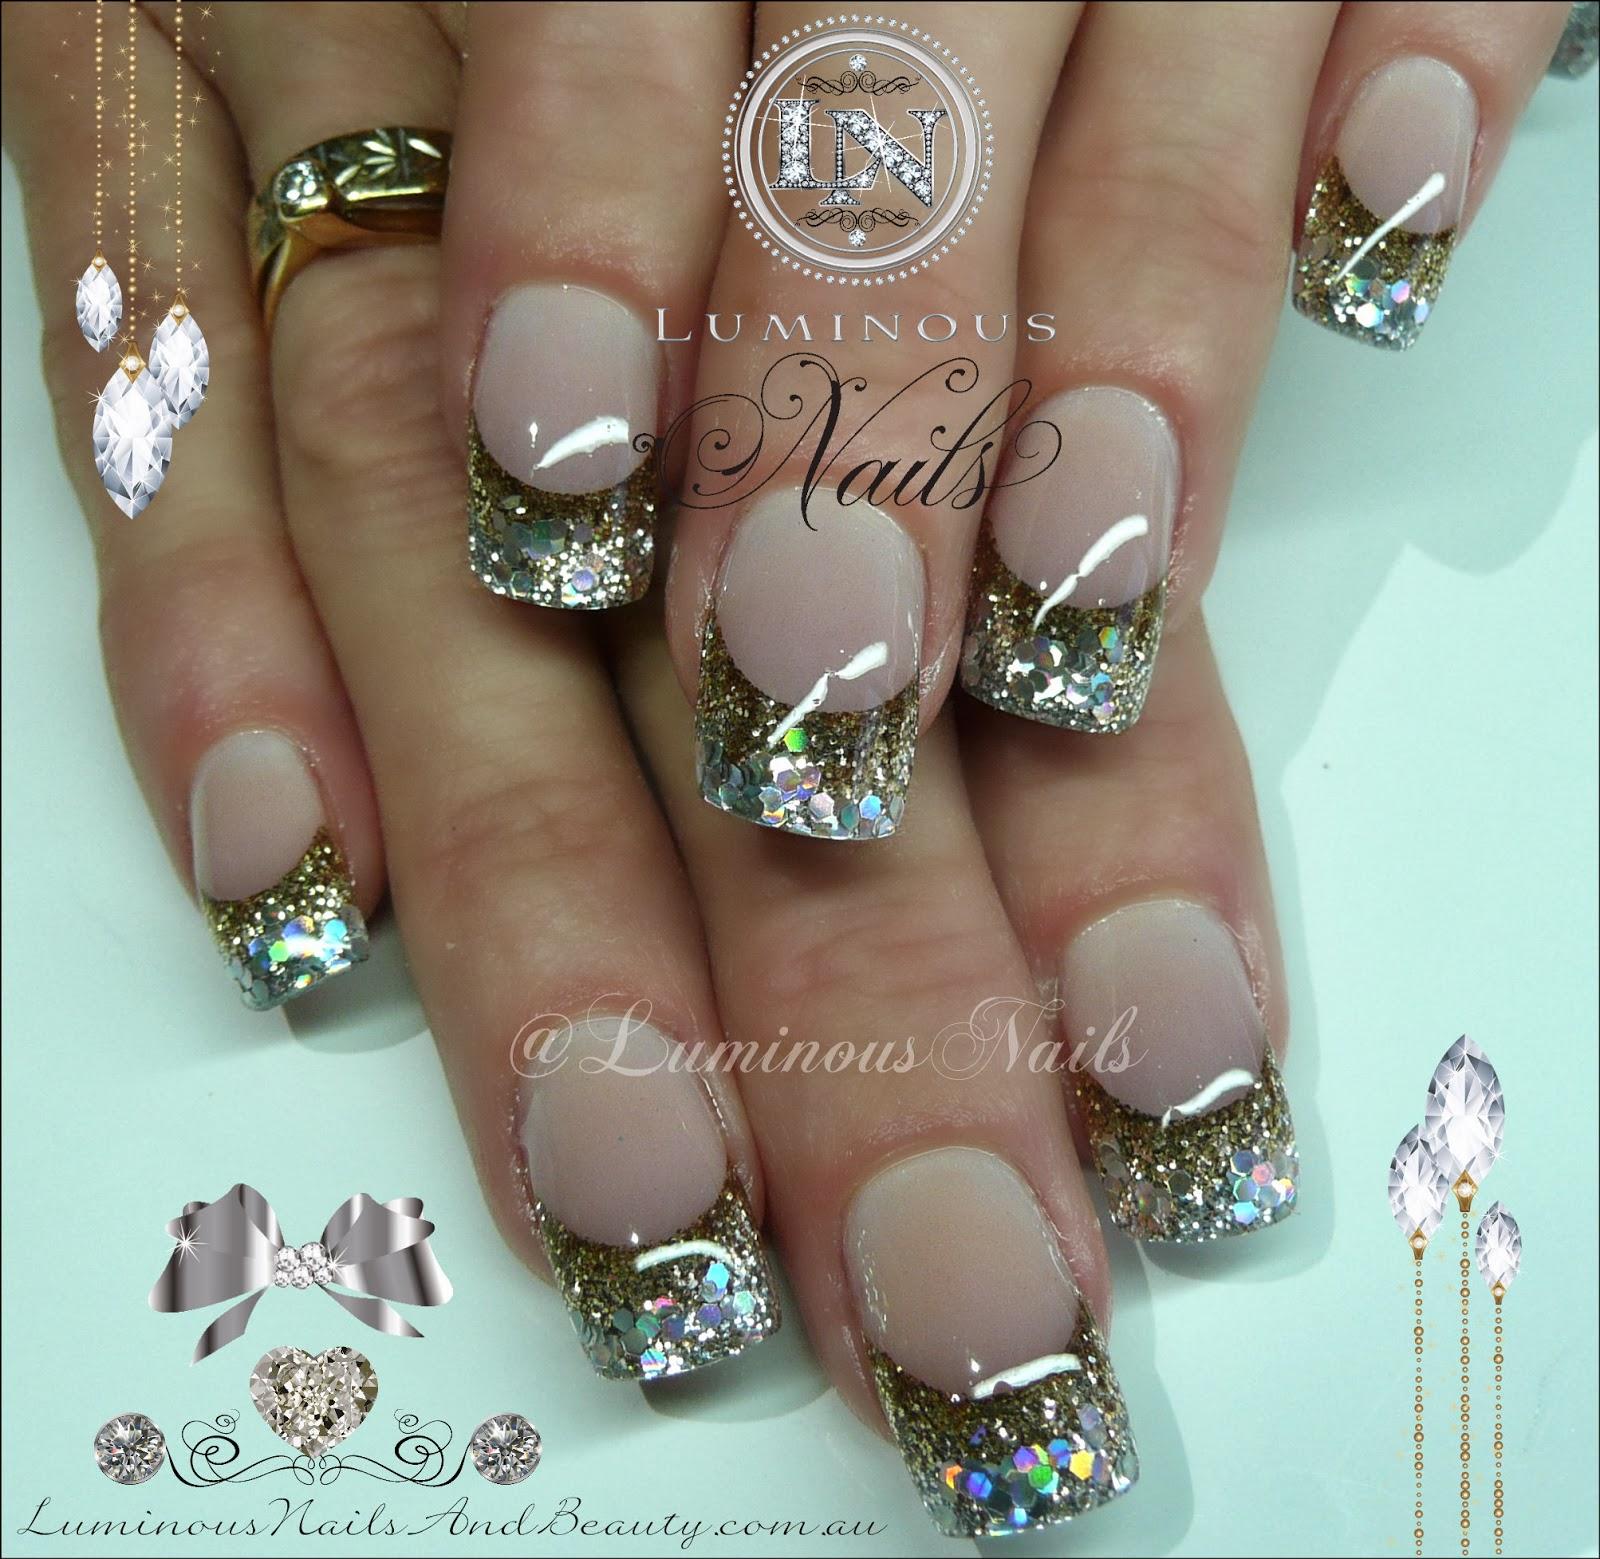 Luminous Nails: February 2014